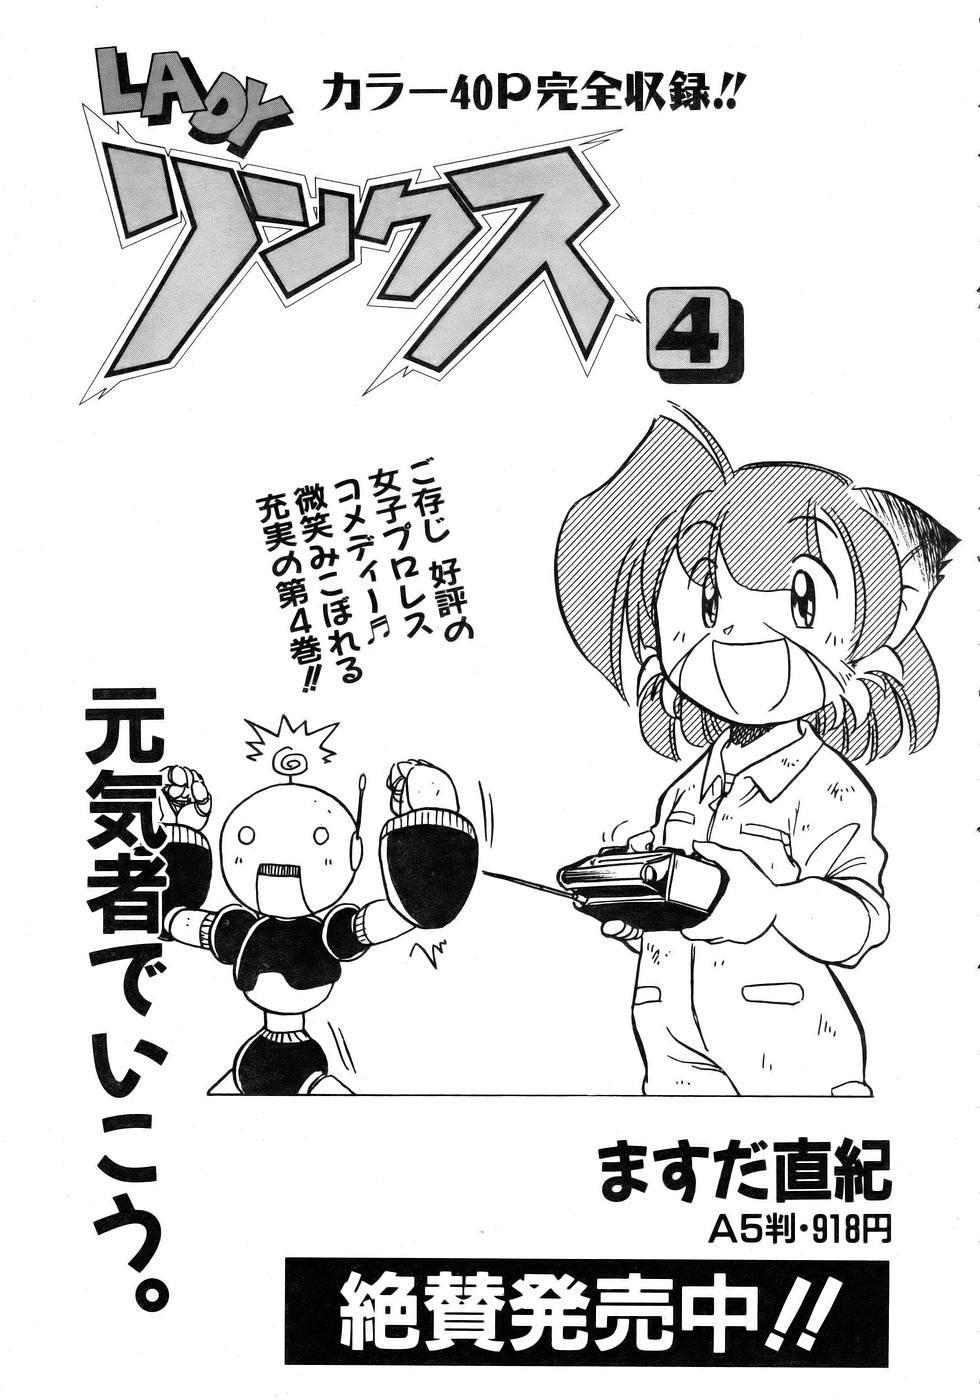 COMIC AUN 2005-12 Vol. 115 194